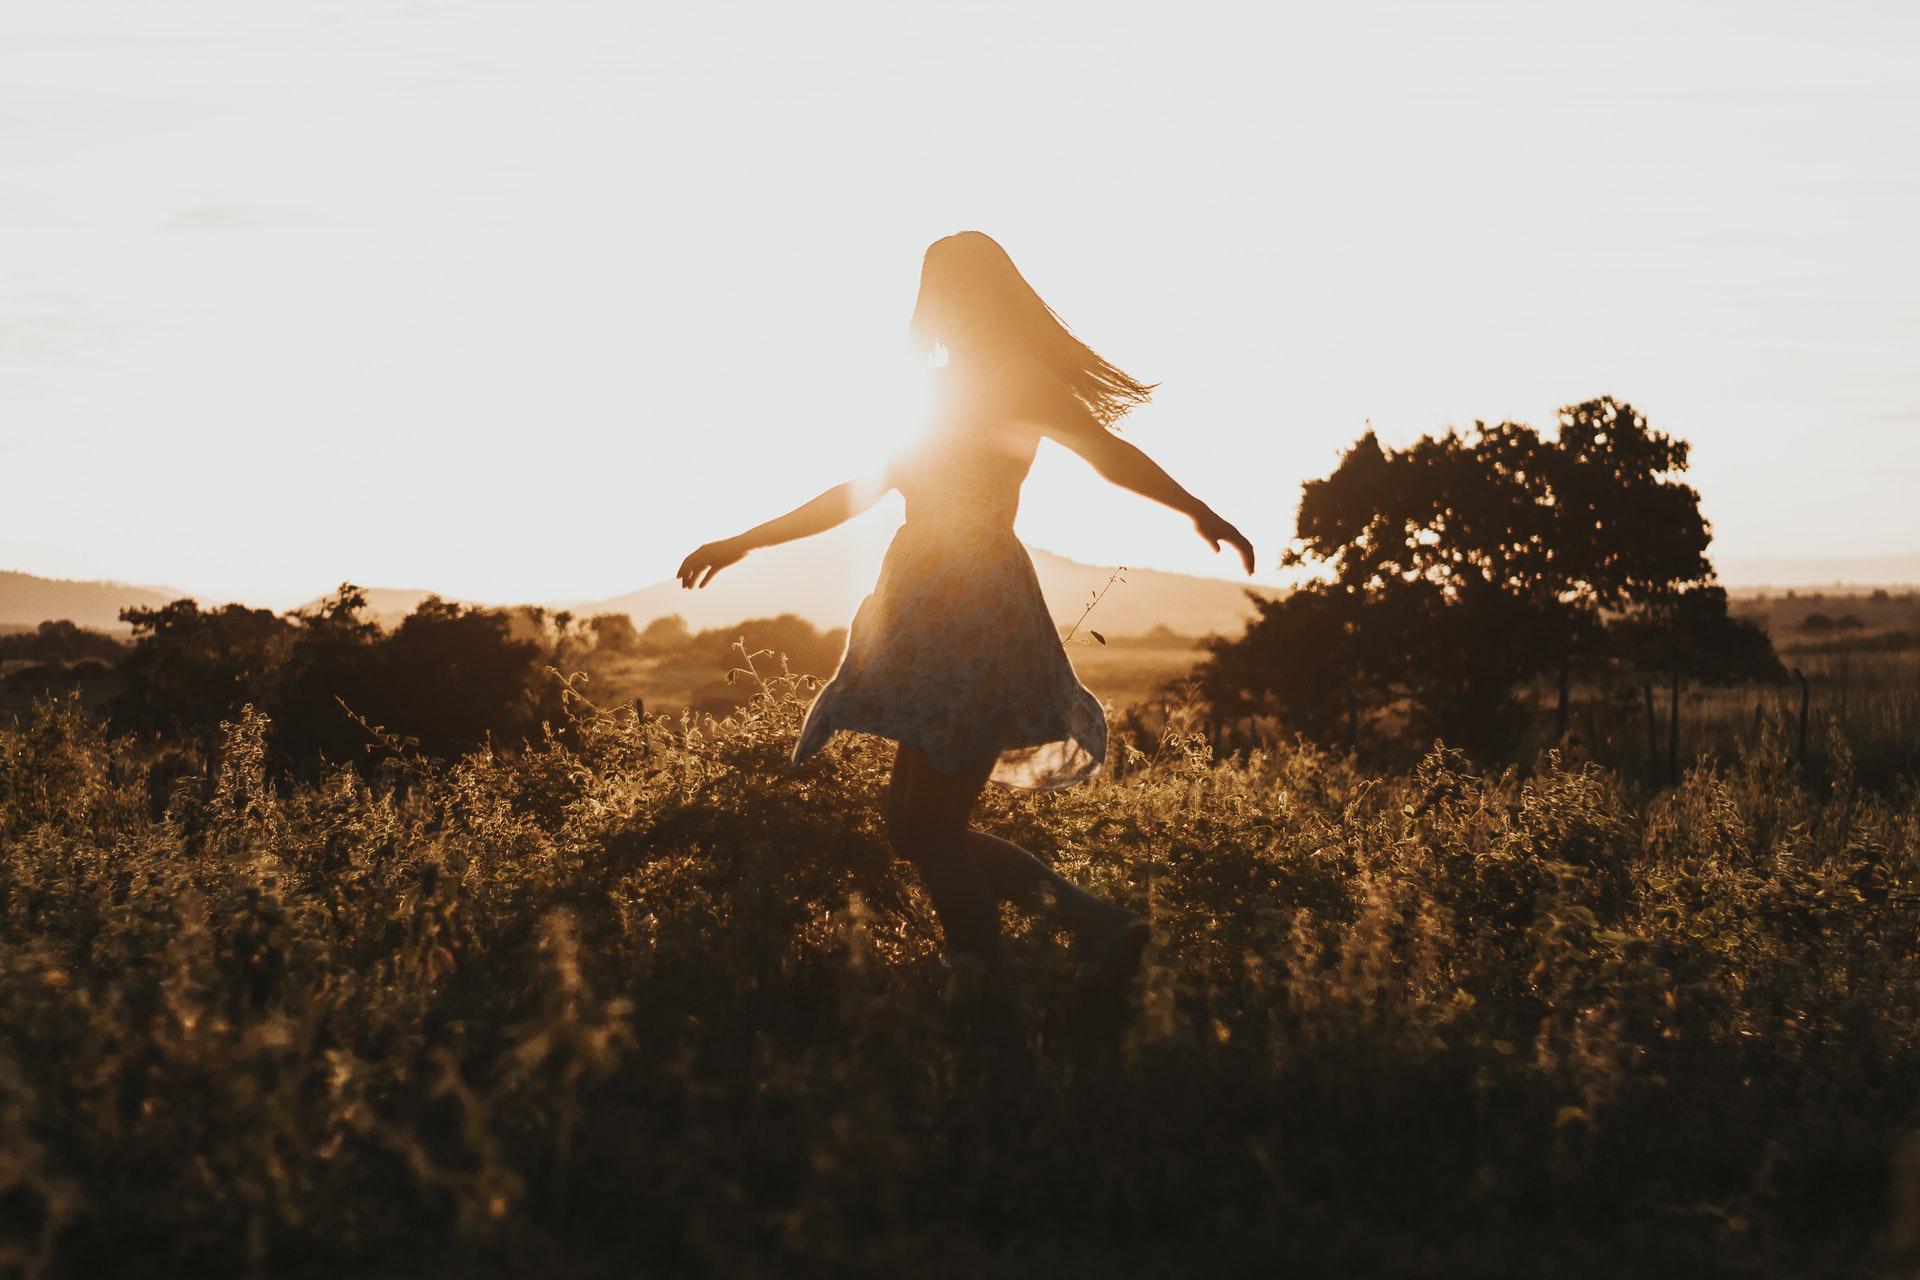 7 Ways to Make Your Life More Fun